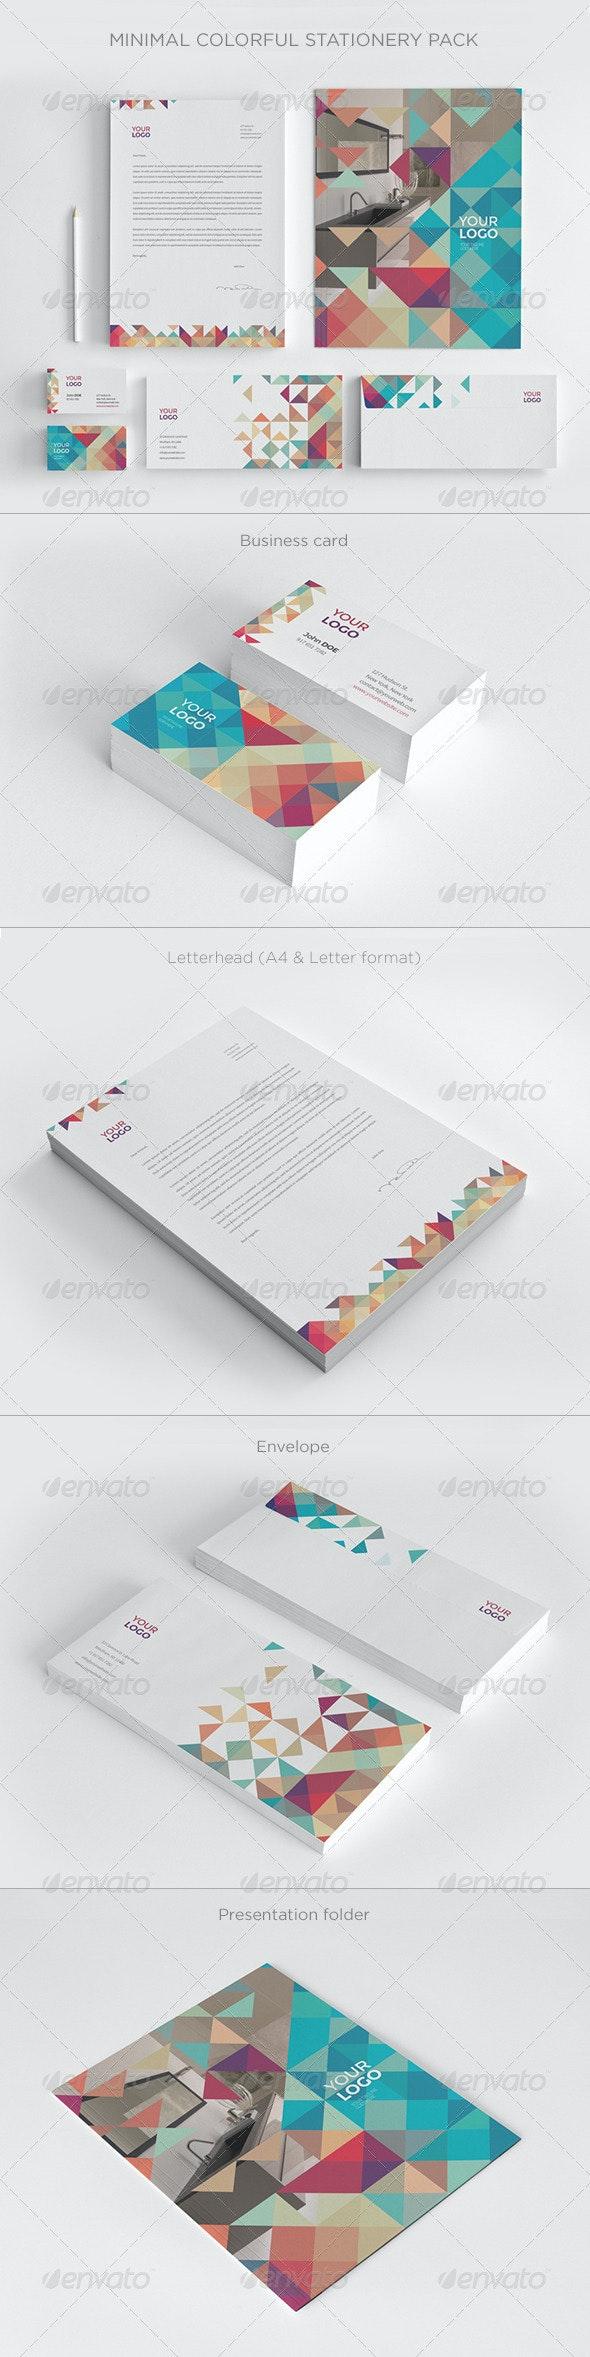 Minimal Colorful Stationery - Stationery Print Templates